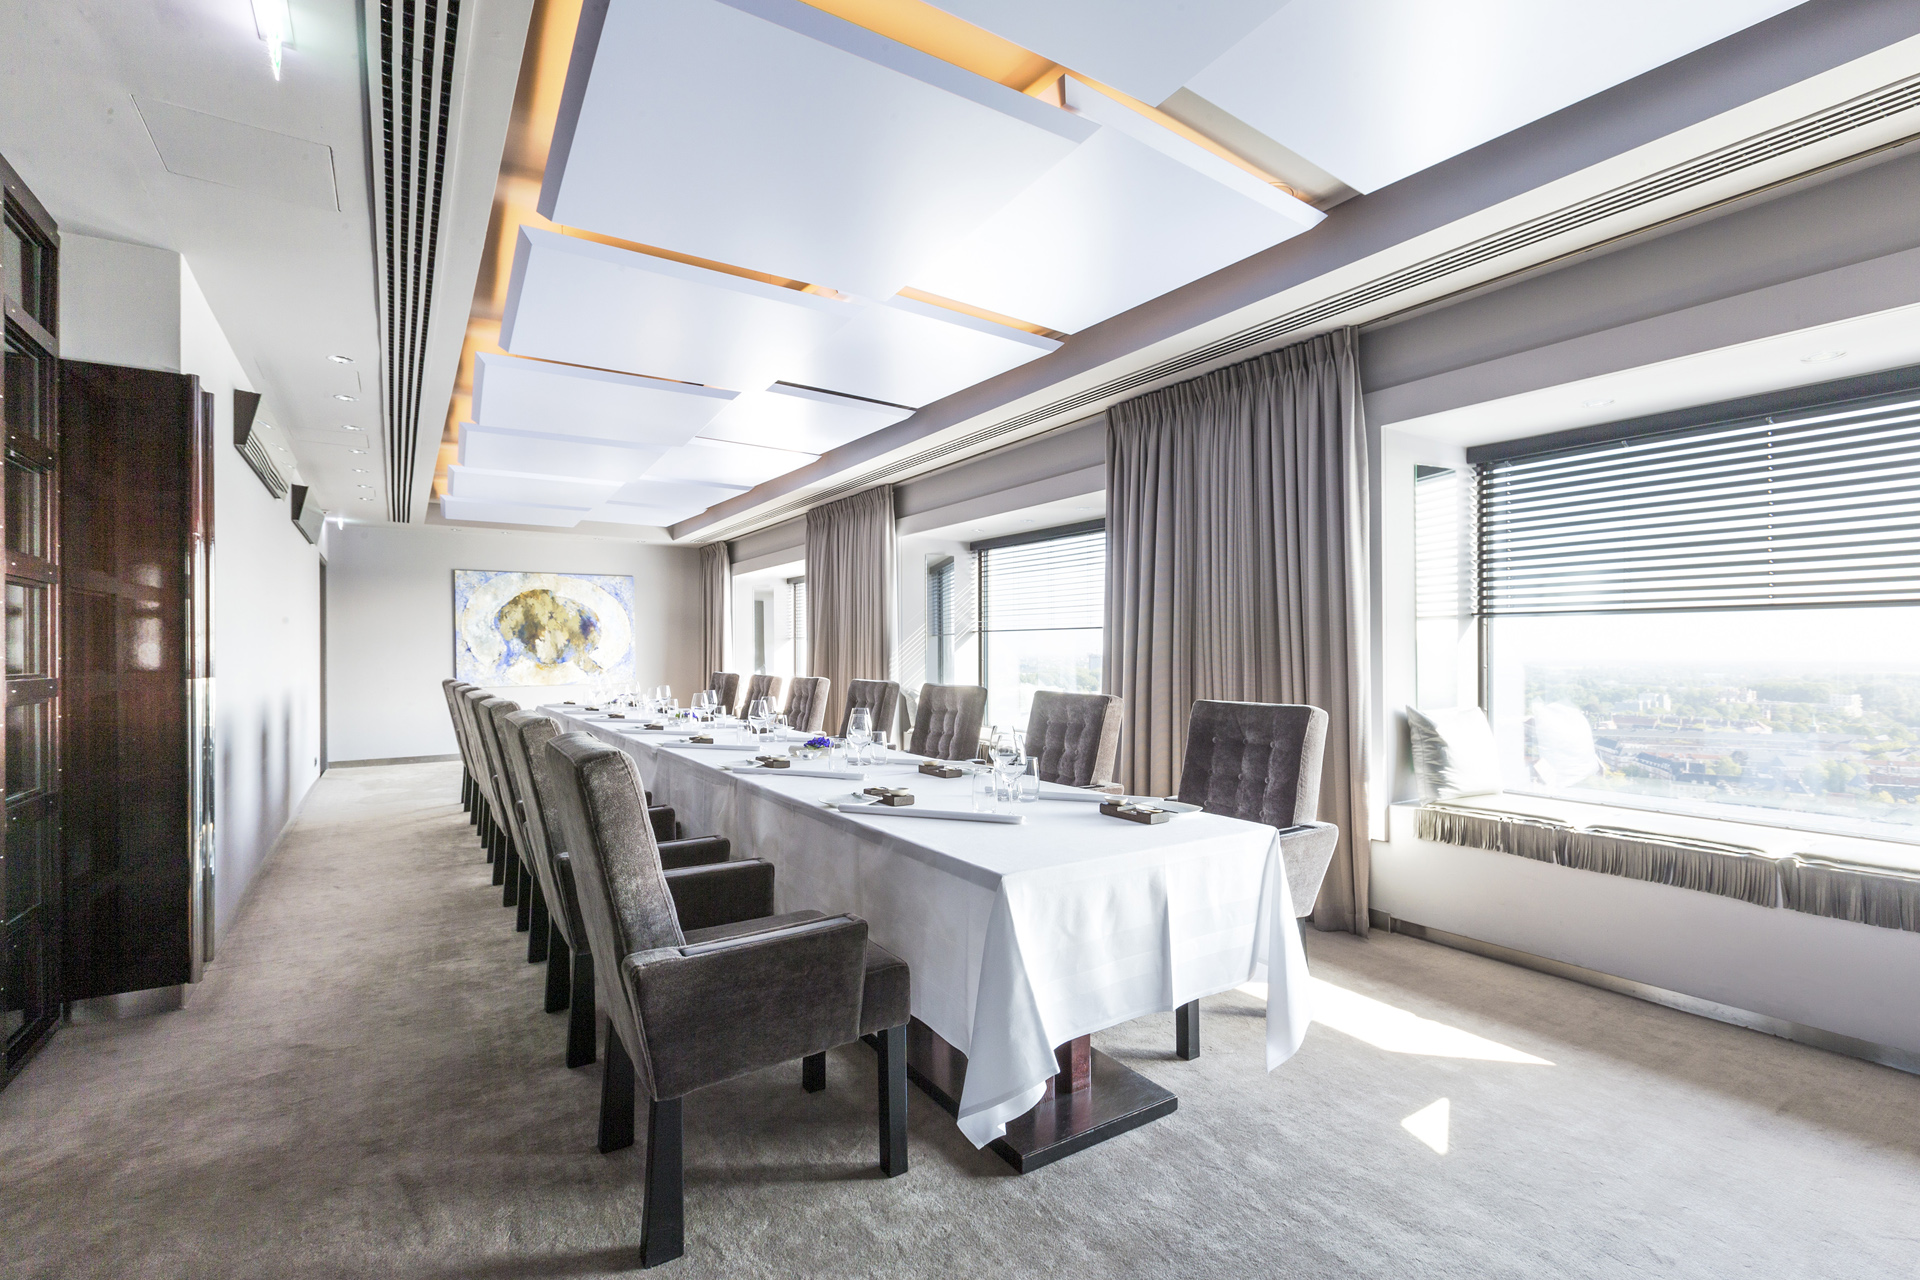 Starlight - Private dining area